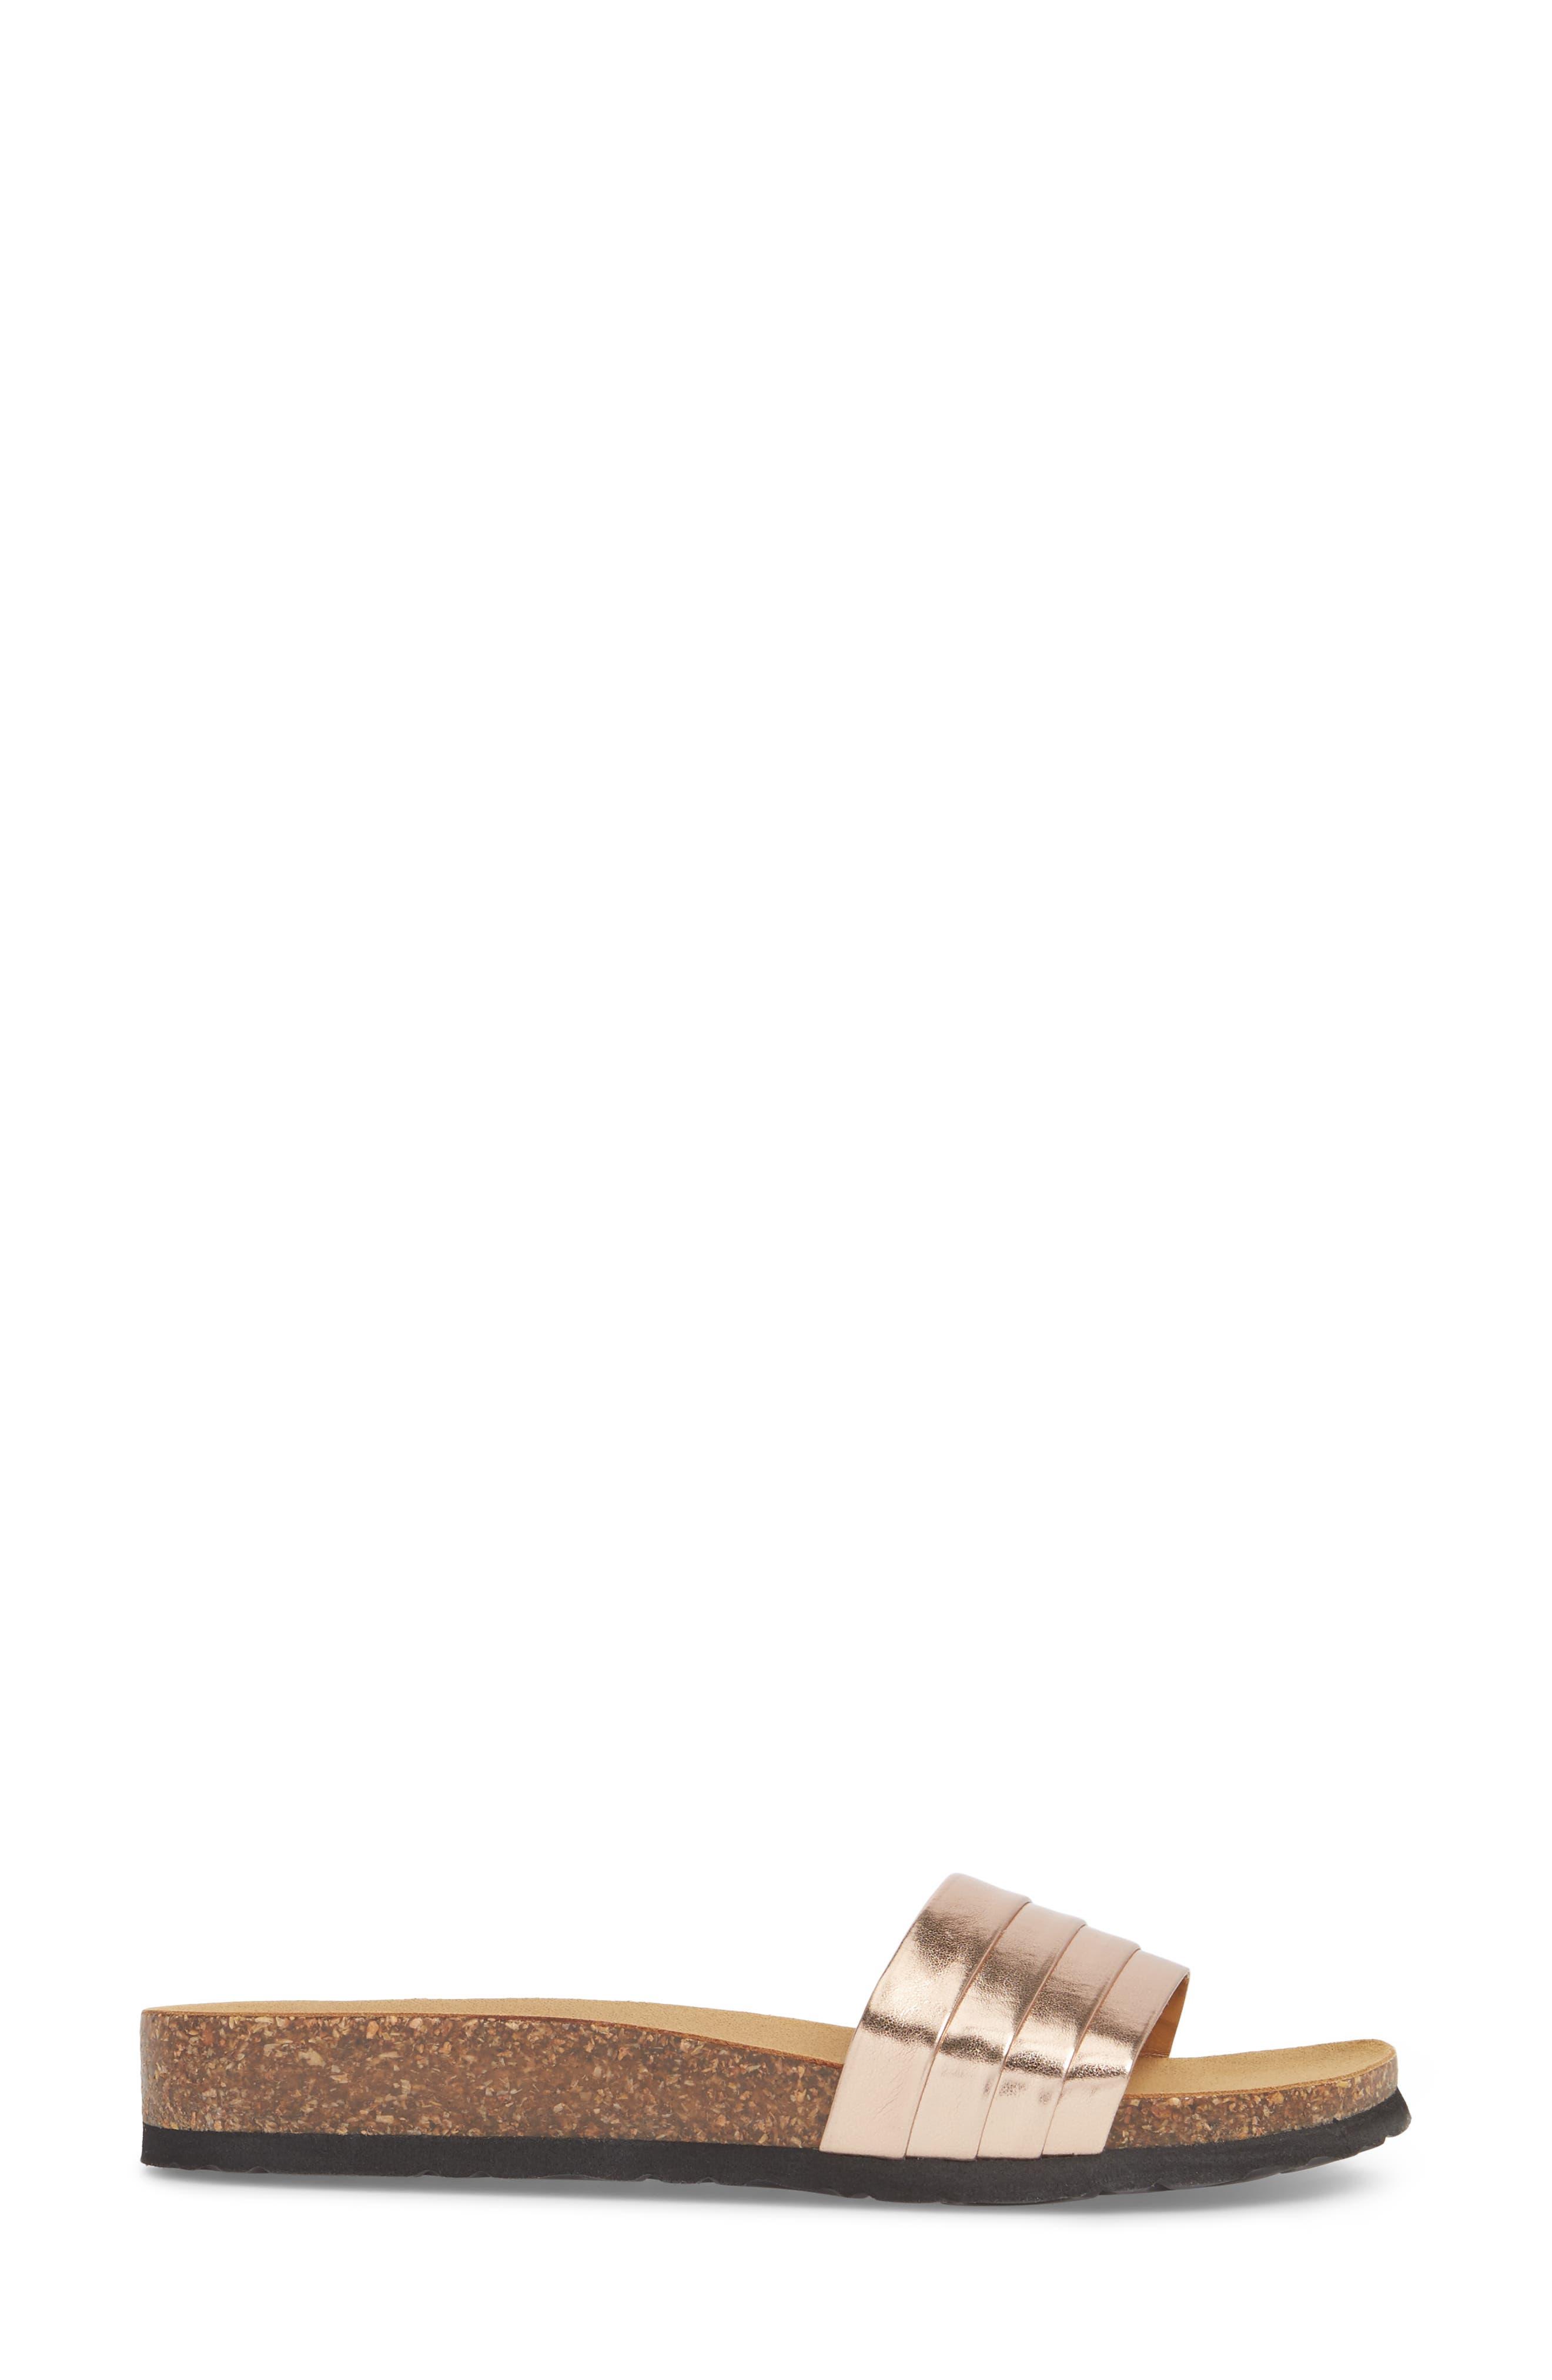 Santos Slide Sandal,                             Alternate thumbnail 3, color,                             ROSE GOLD FAUX LEATHER